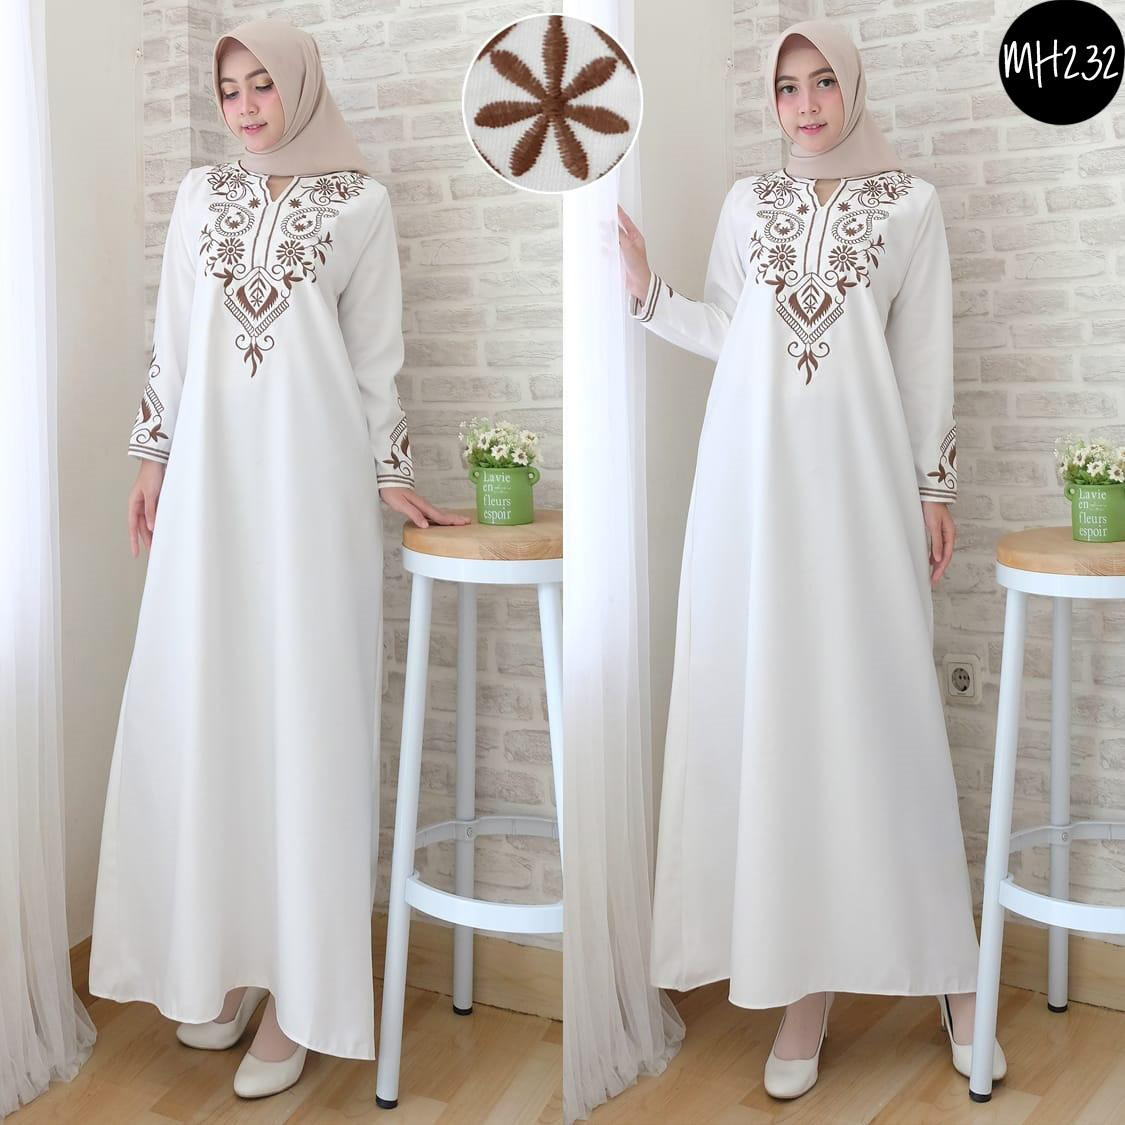 MH232 maxi dress panjang gamis putih fashion muslim hijab hijaber baju muslim muslimah wanita gamis syari balotelli jumbo katun jepang murah